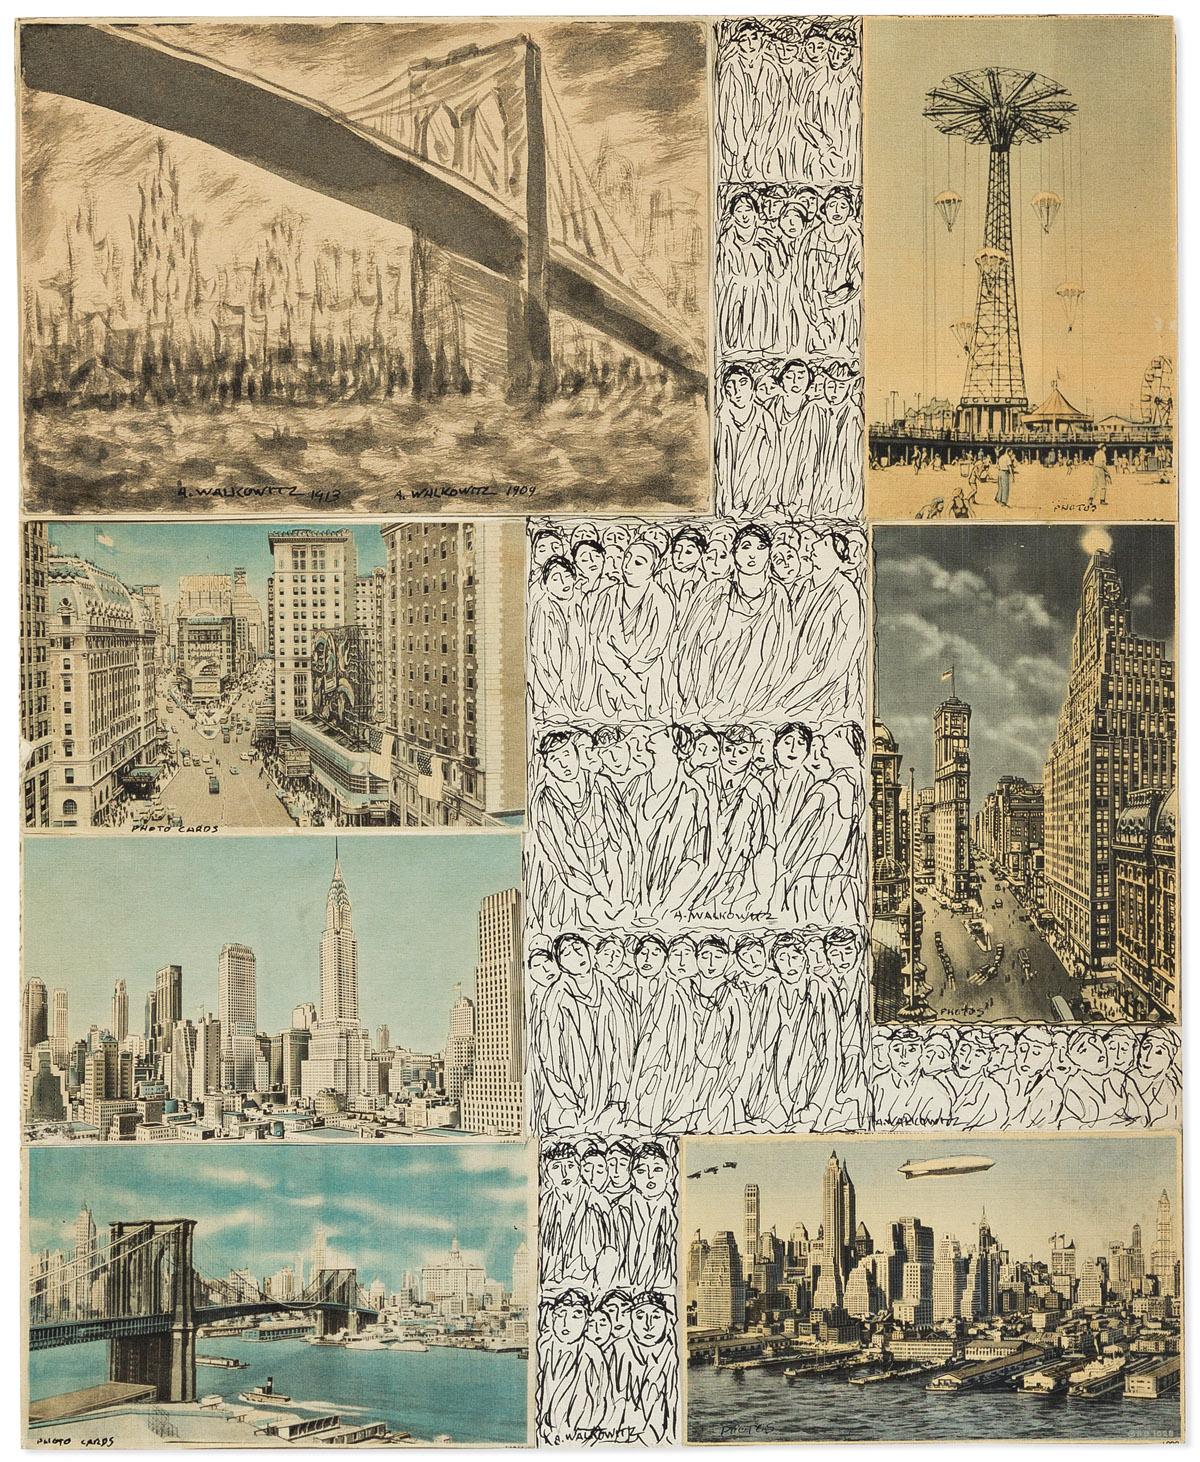 ABRAHAM WALKOWITZ (1878-1965) New York.